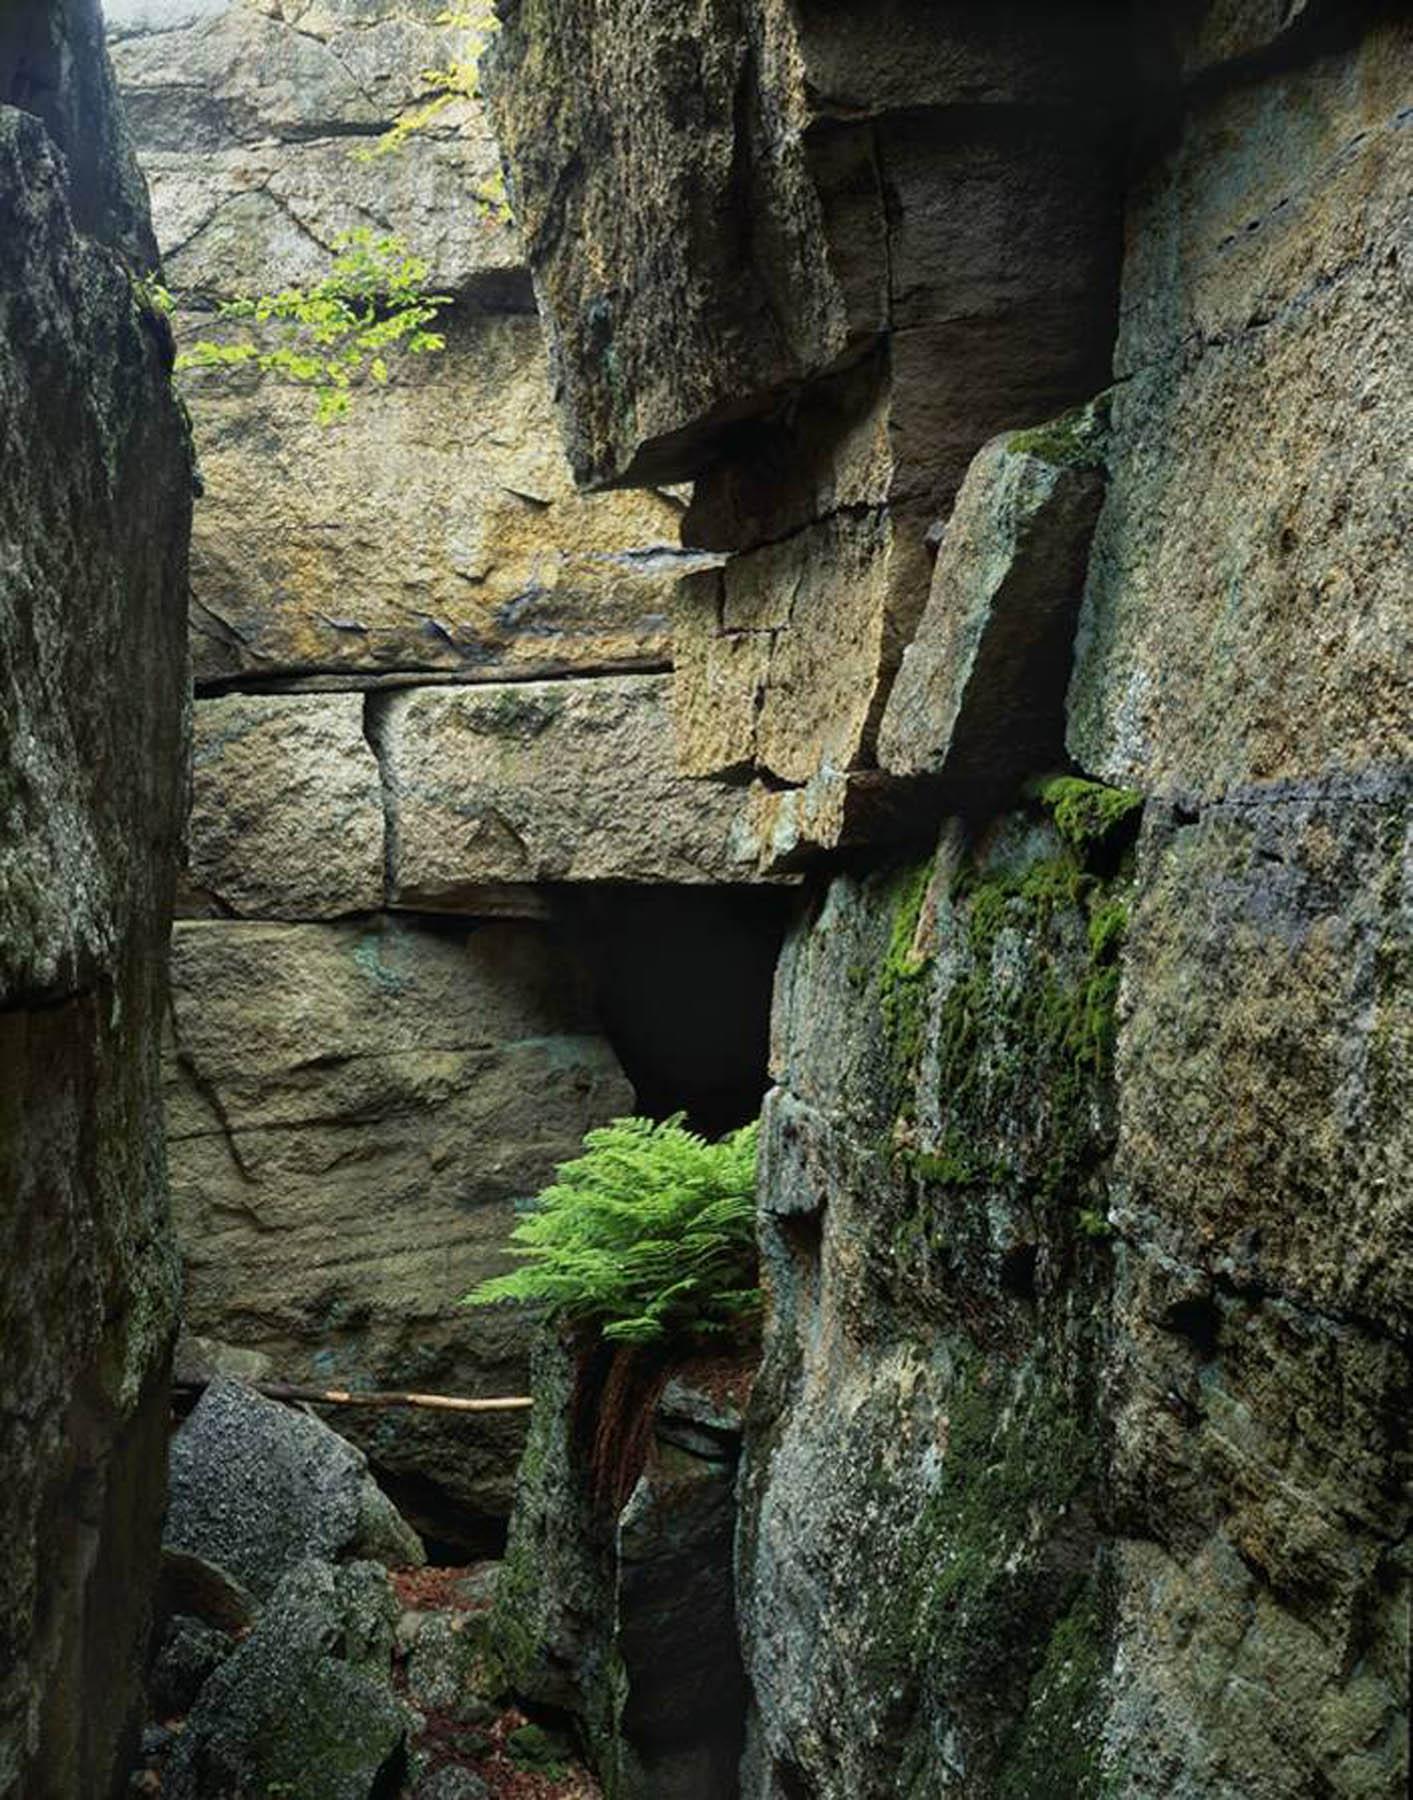 Sam's Point Ice Cave Crevasse